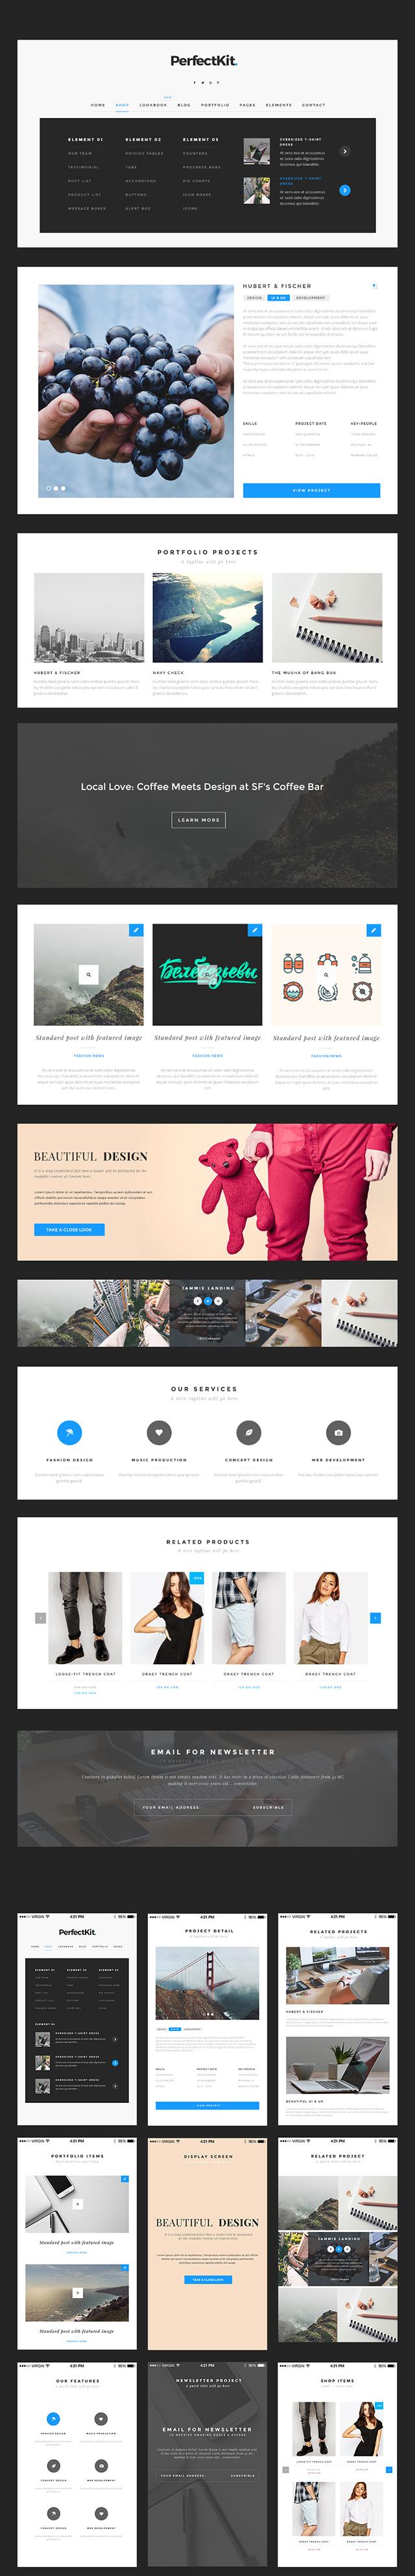 Freebie: PerfectKit – desktop & mobile ready modern UI kit ...